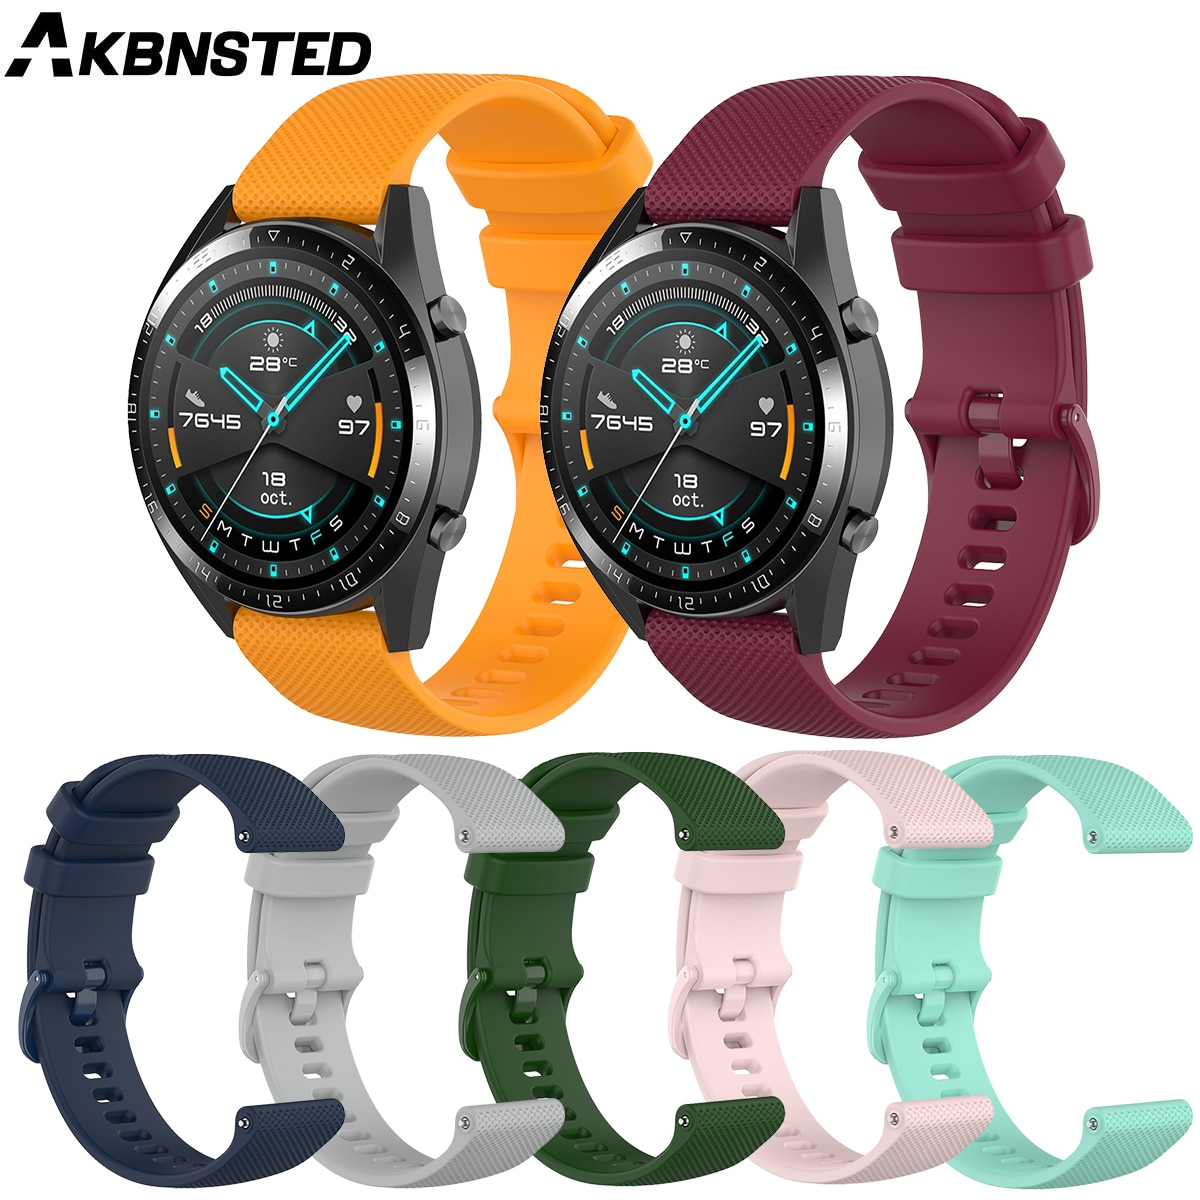 AKBNSTED 20 22MM correa de silicona colorida para reloj inteligente Huawei Watch GT 2/Huami Amazfit GTR/GTS/Stratos3, correa de repuesto para reloj inteligente